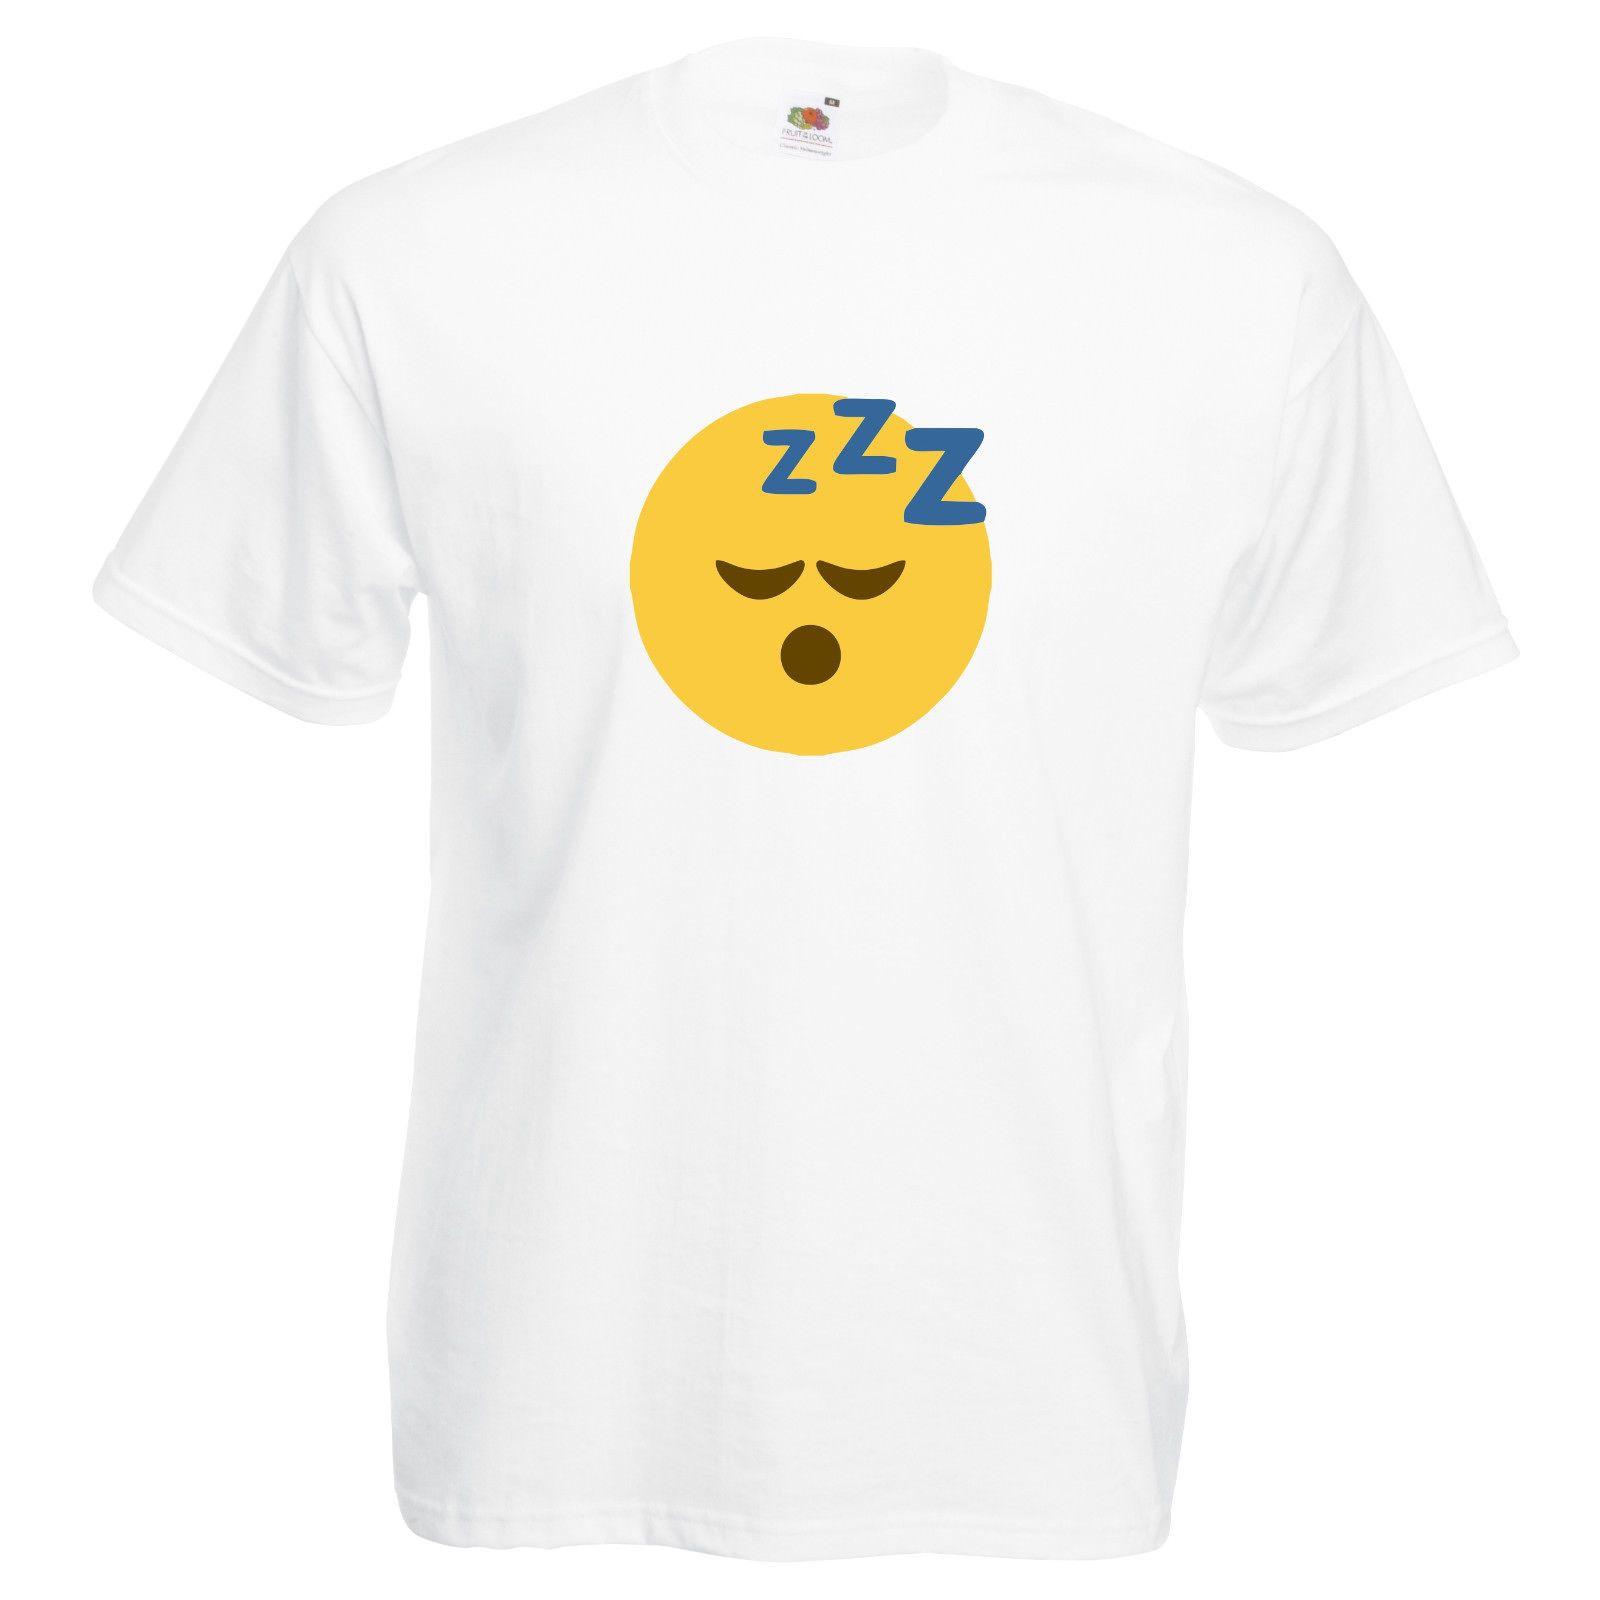 Emoji Sleepy T Shirt Funny Cute Unisex Viral Trend